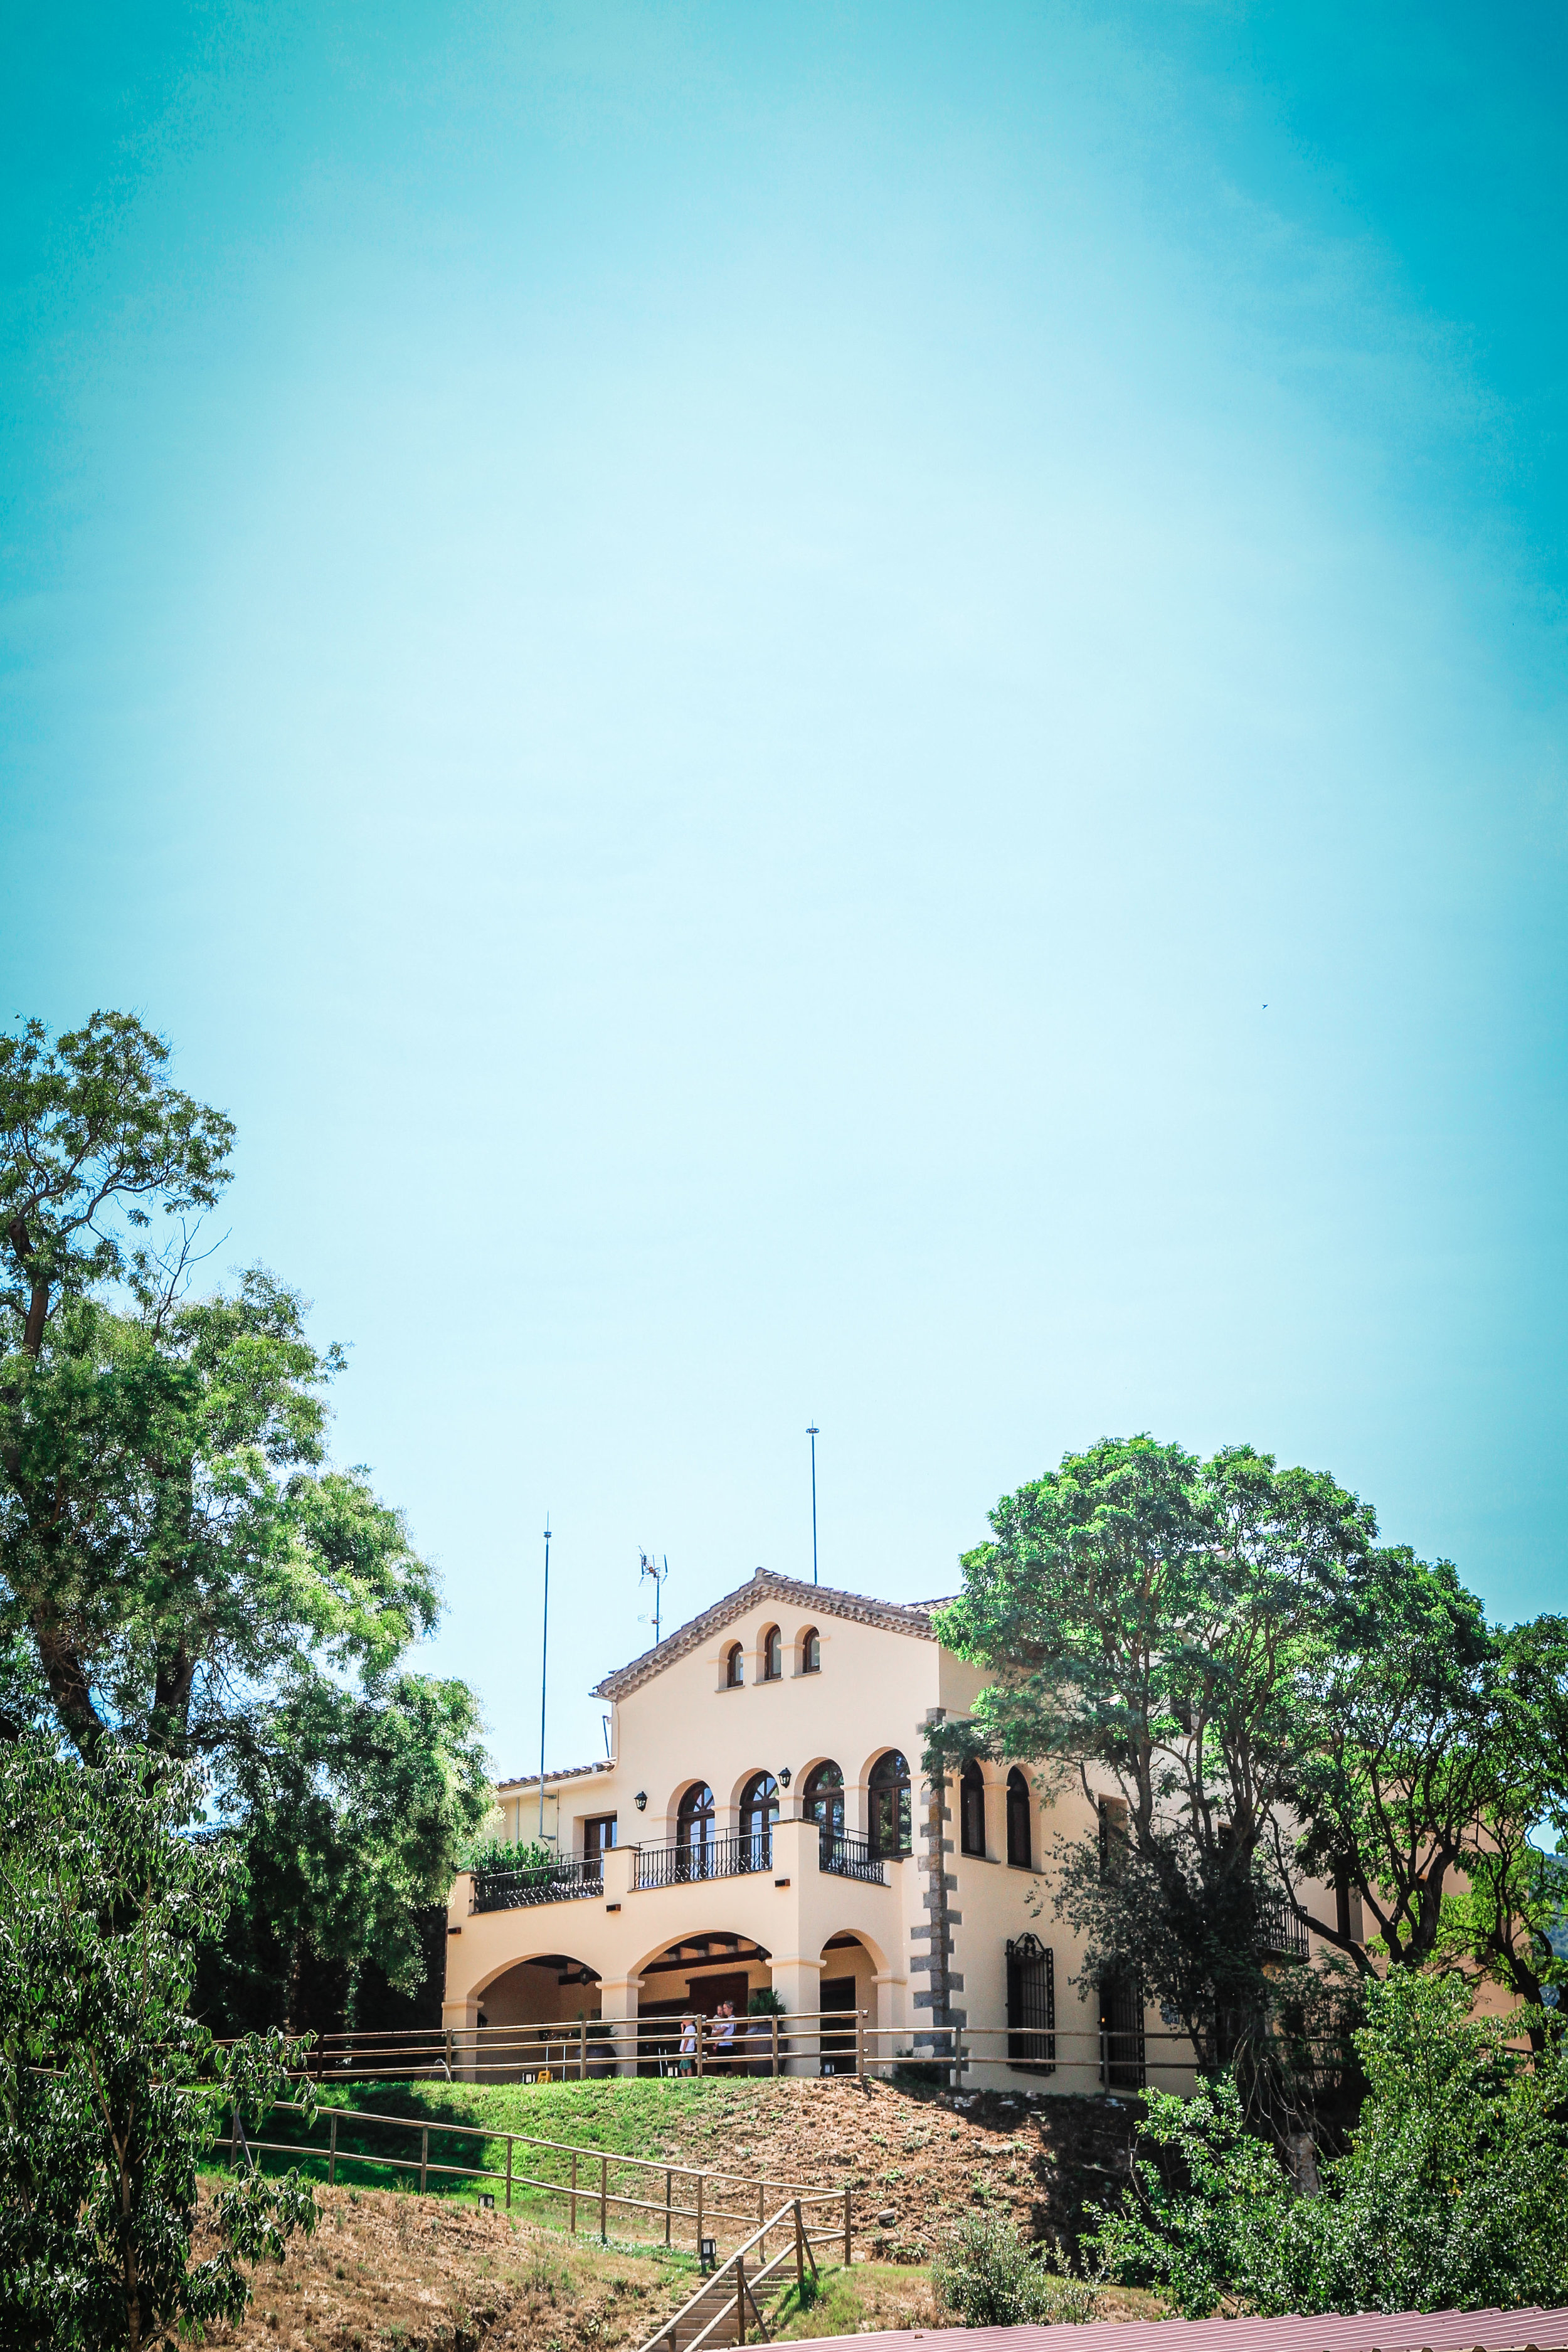 Hotel Mas Salagros - Ecoresort